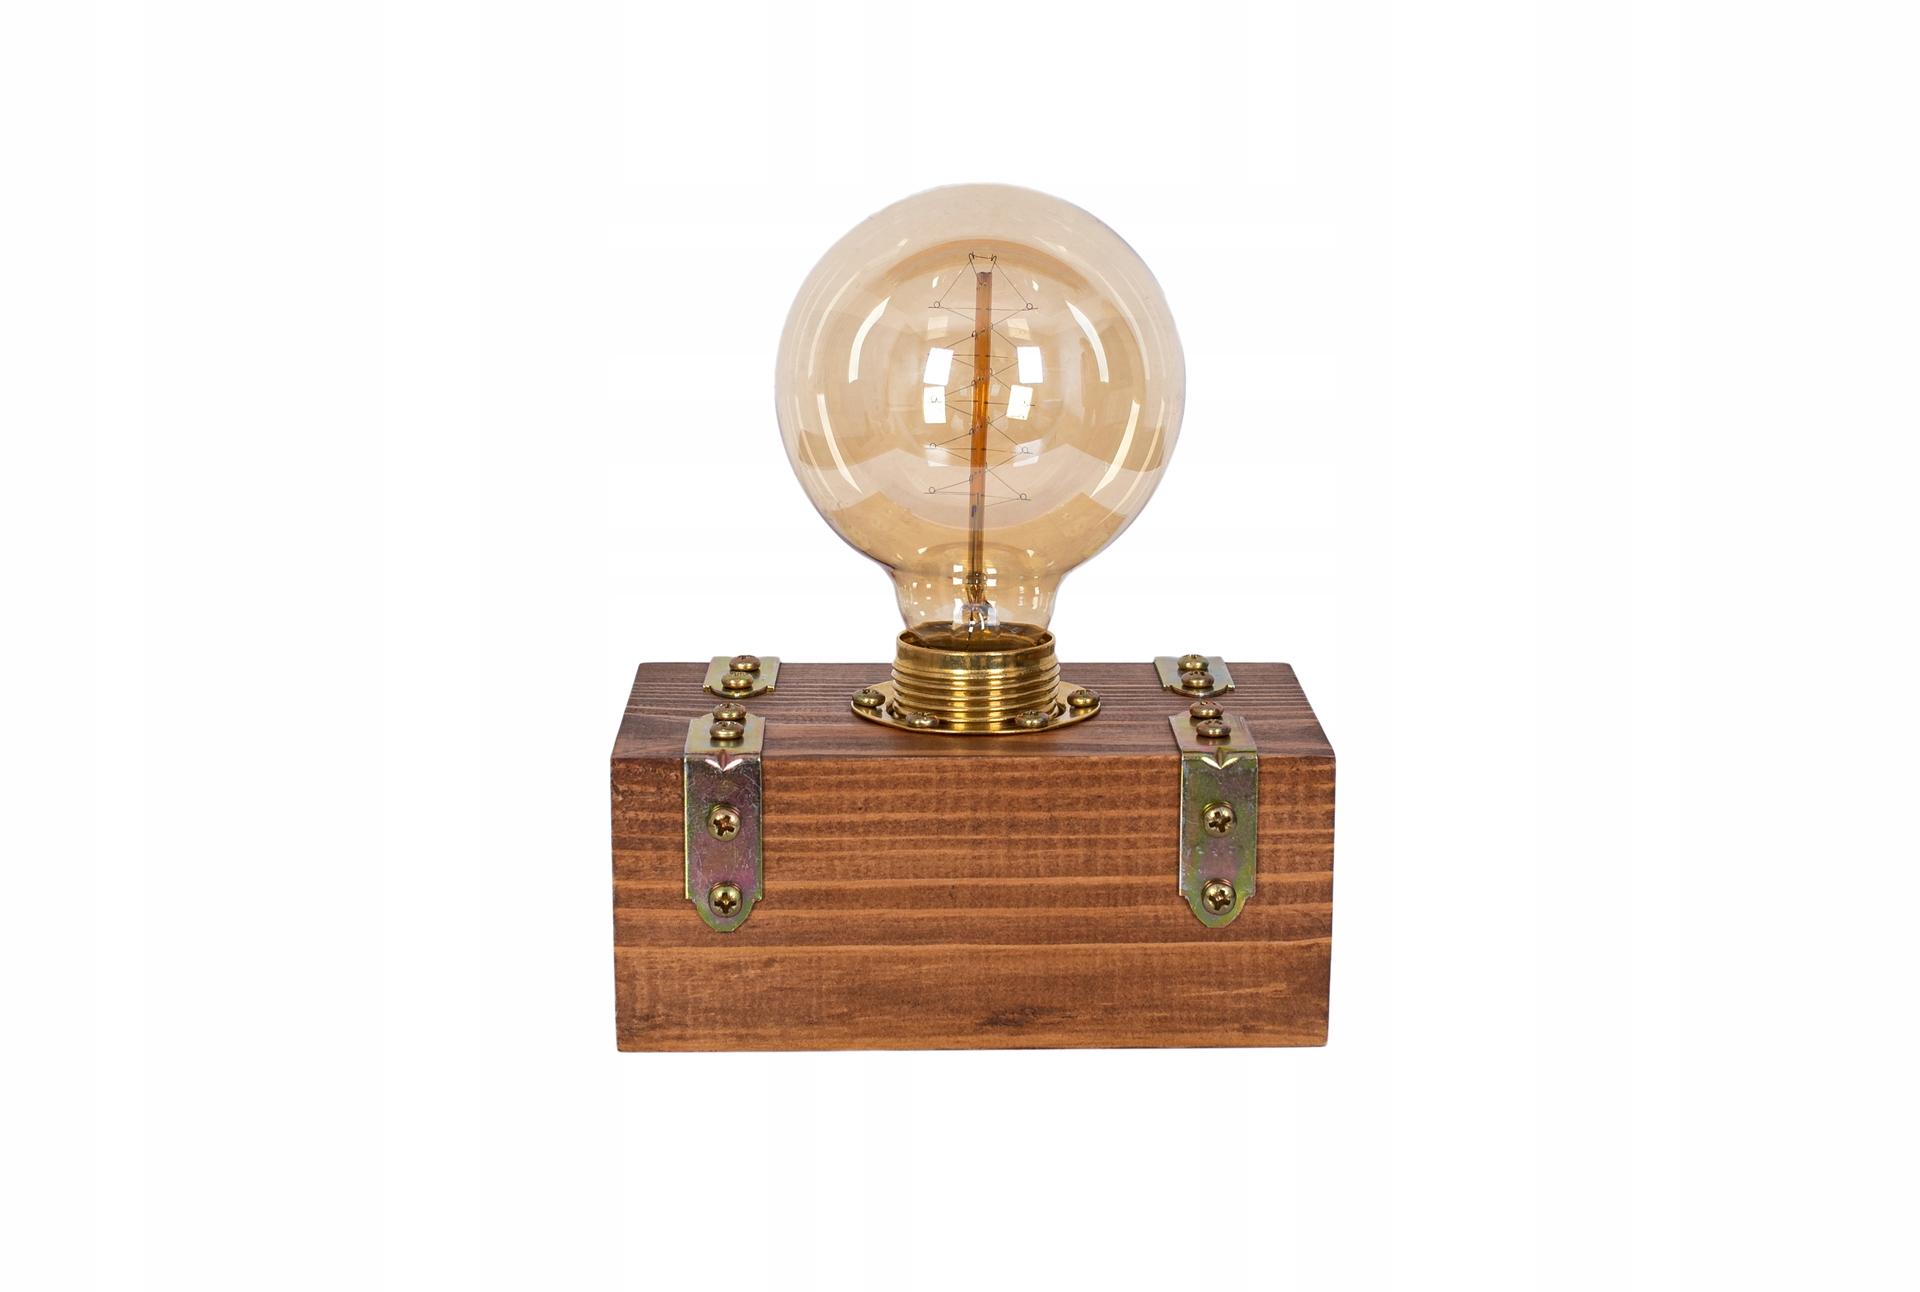 Stolná lampa noc dreva skrzyneczka Edison